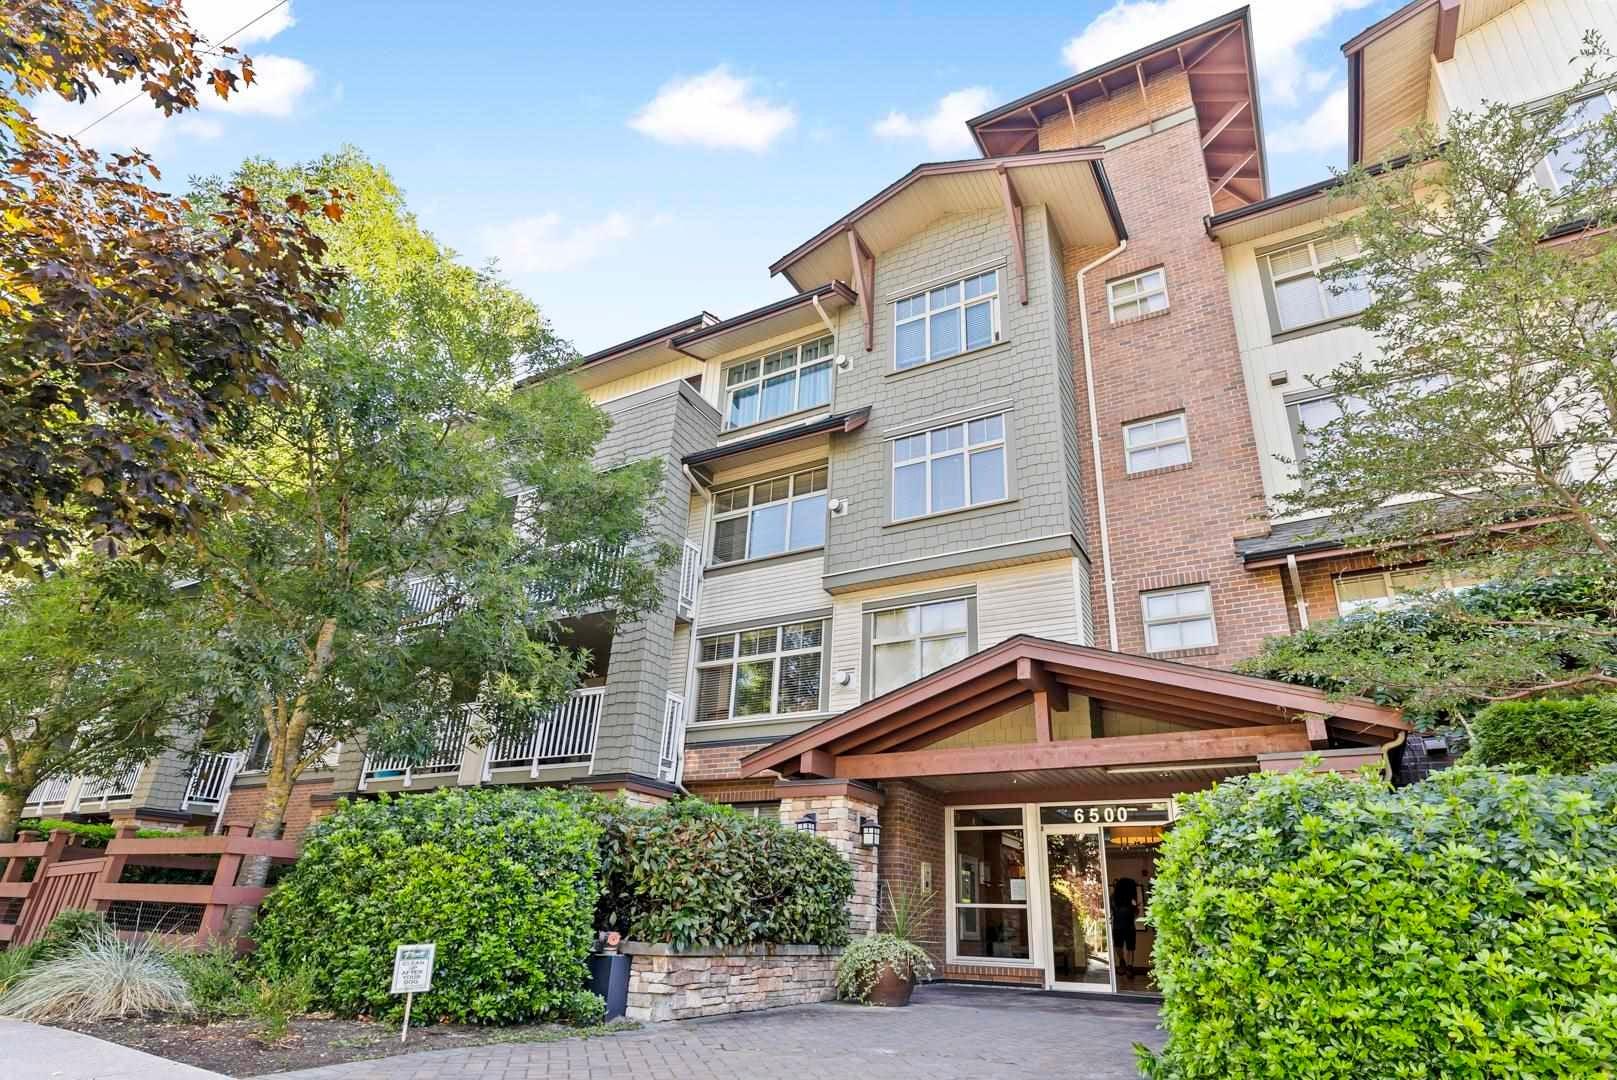 107 6500 194 STREET - Clayton Apartment/Condo for sale, 1 Bedroom (R2605423) - #1